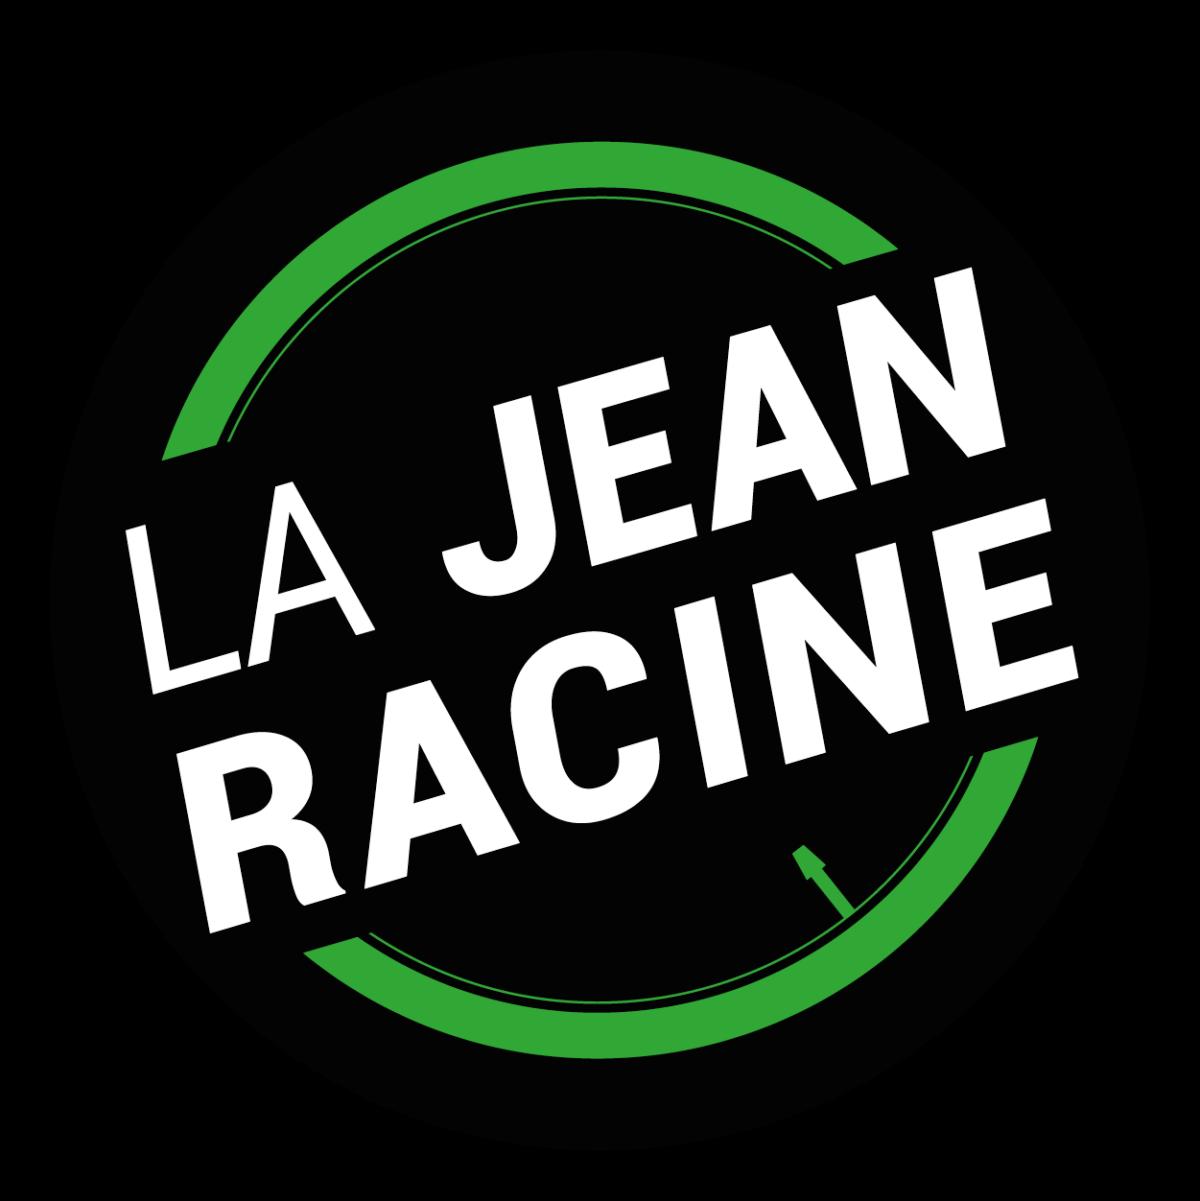 La Jean Racine